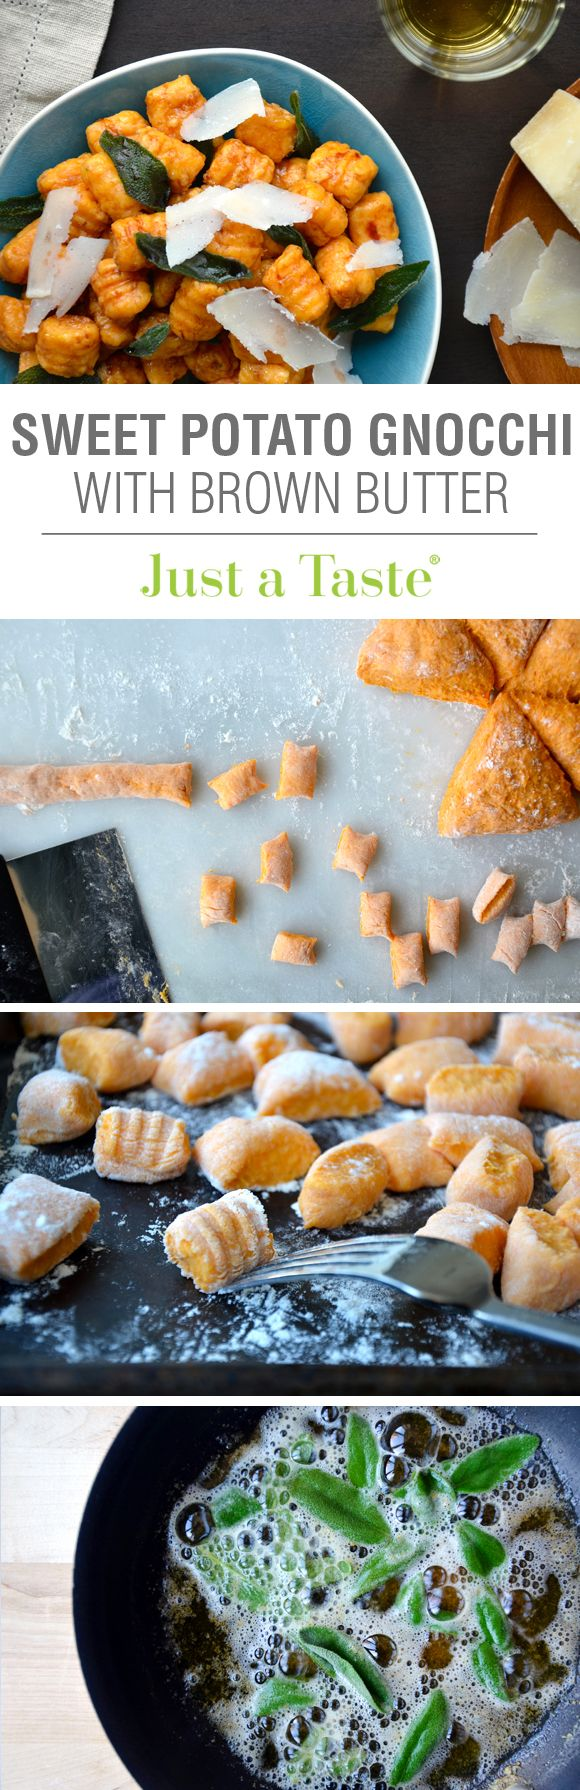 Sweet Potato Gnocchi with Balsamic Brown Butter #recipe via justataste.com